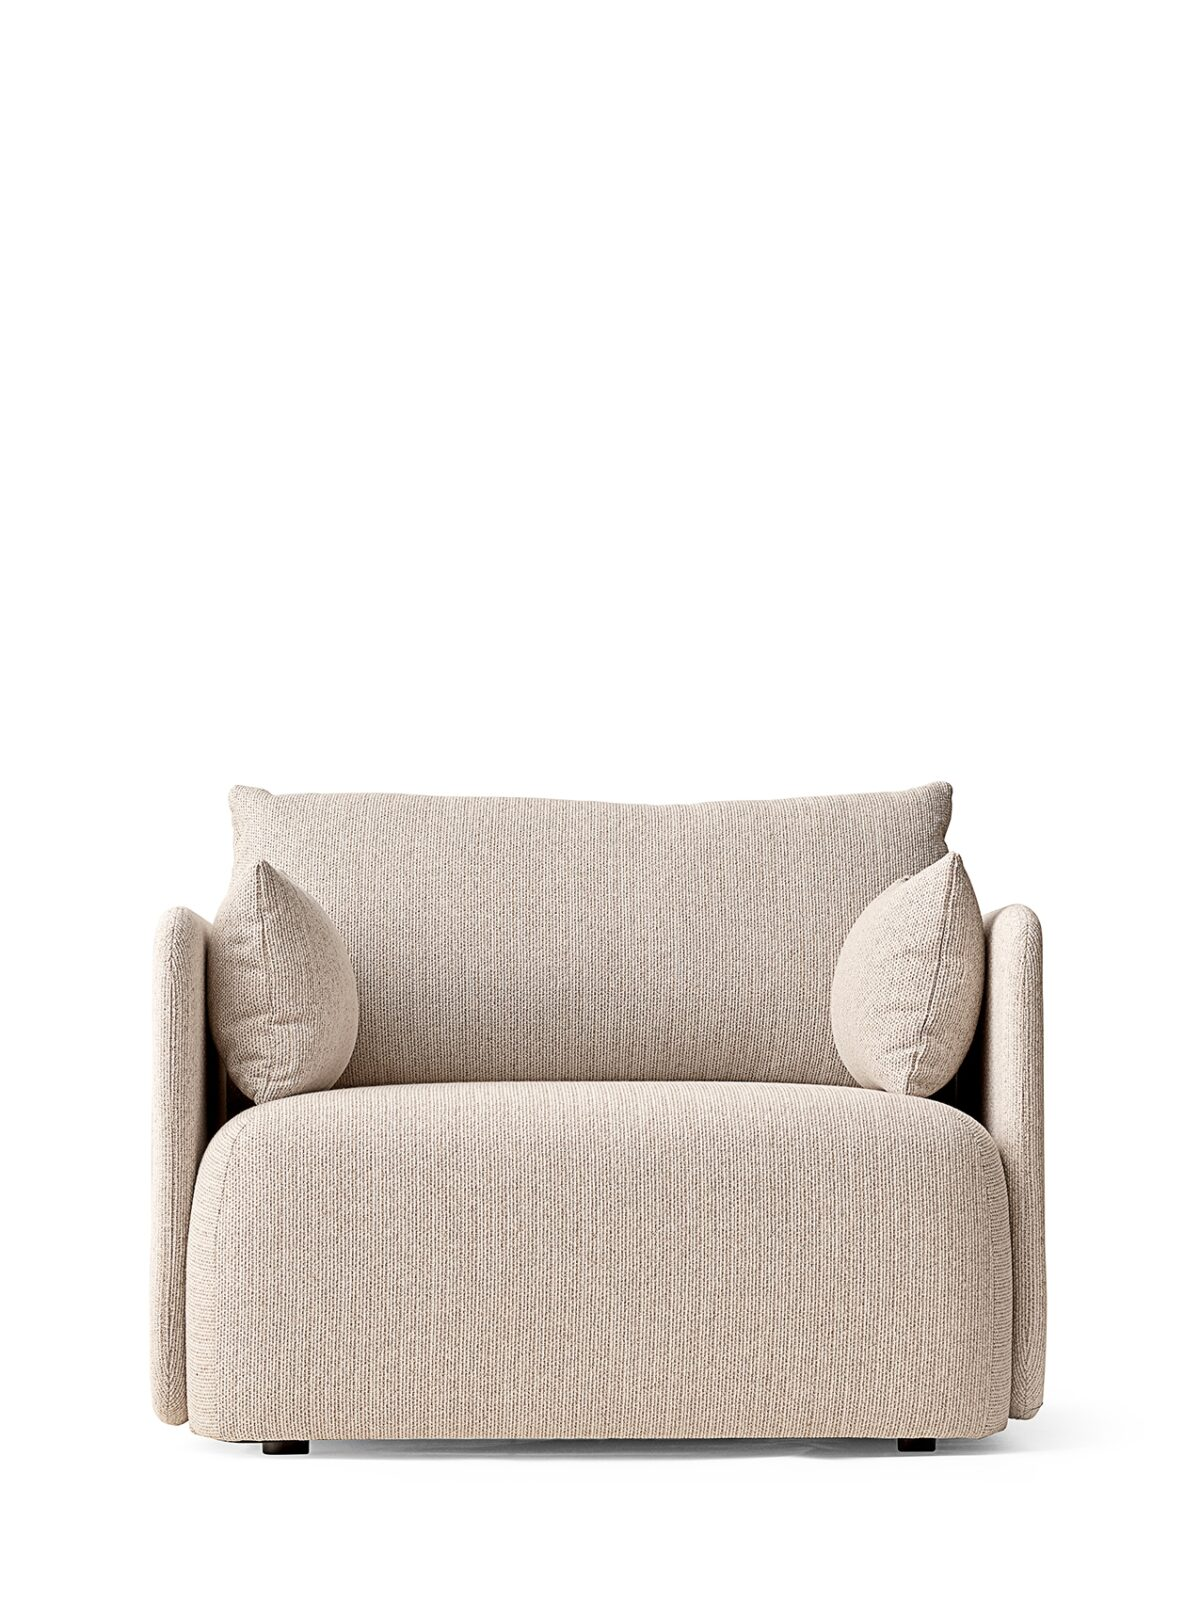 9849029 Offset Sofa 1 Seater Savannah 202 front2019 06 25 13 54 30 653